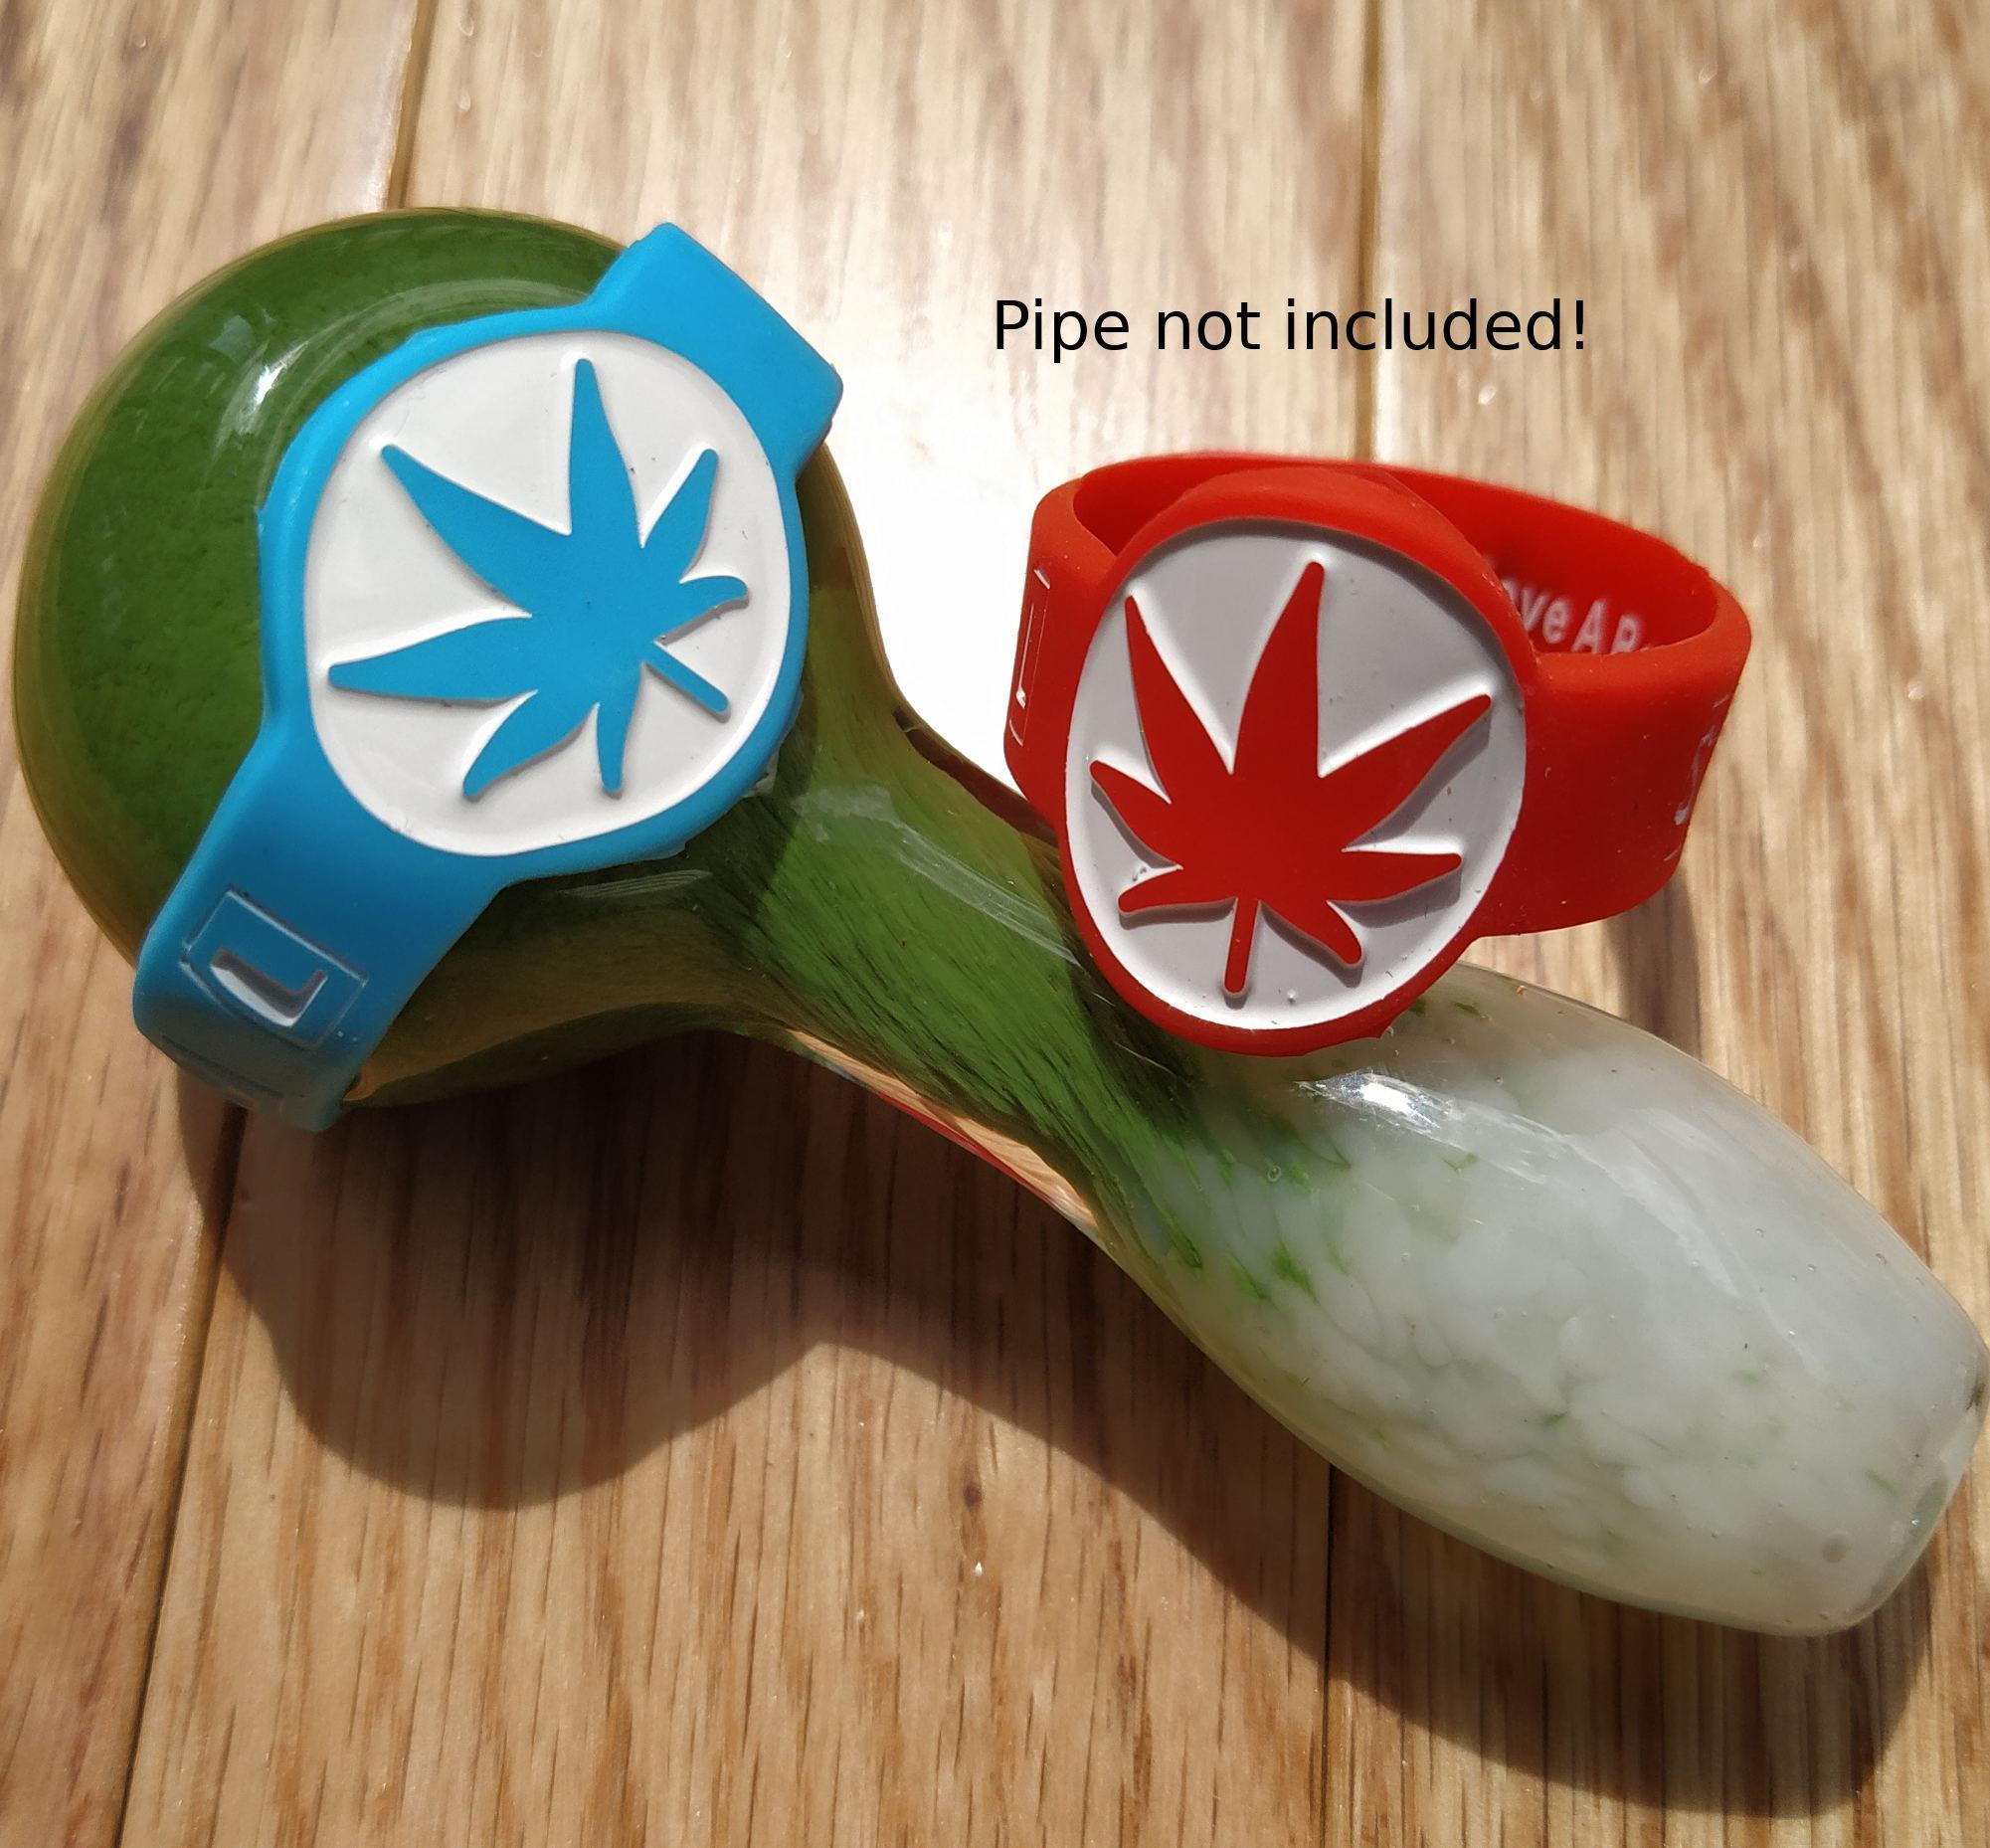 mariajana leaf save-a-bowl product pic.